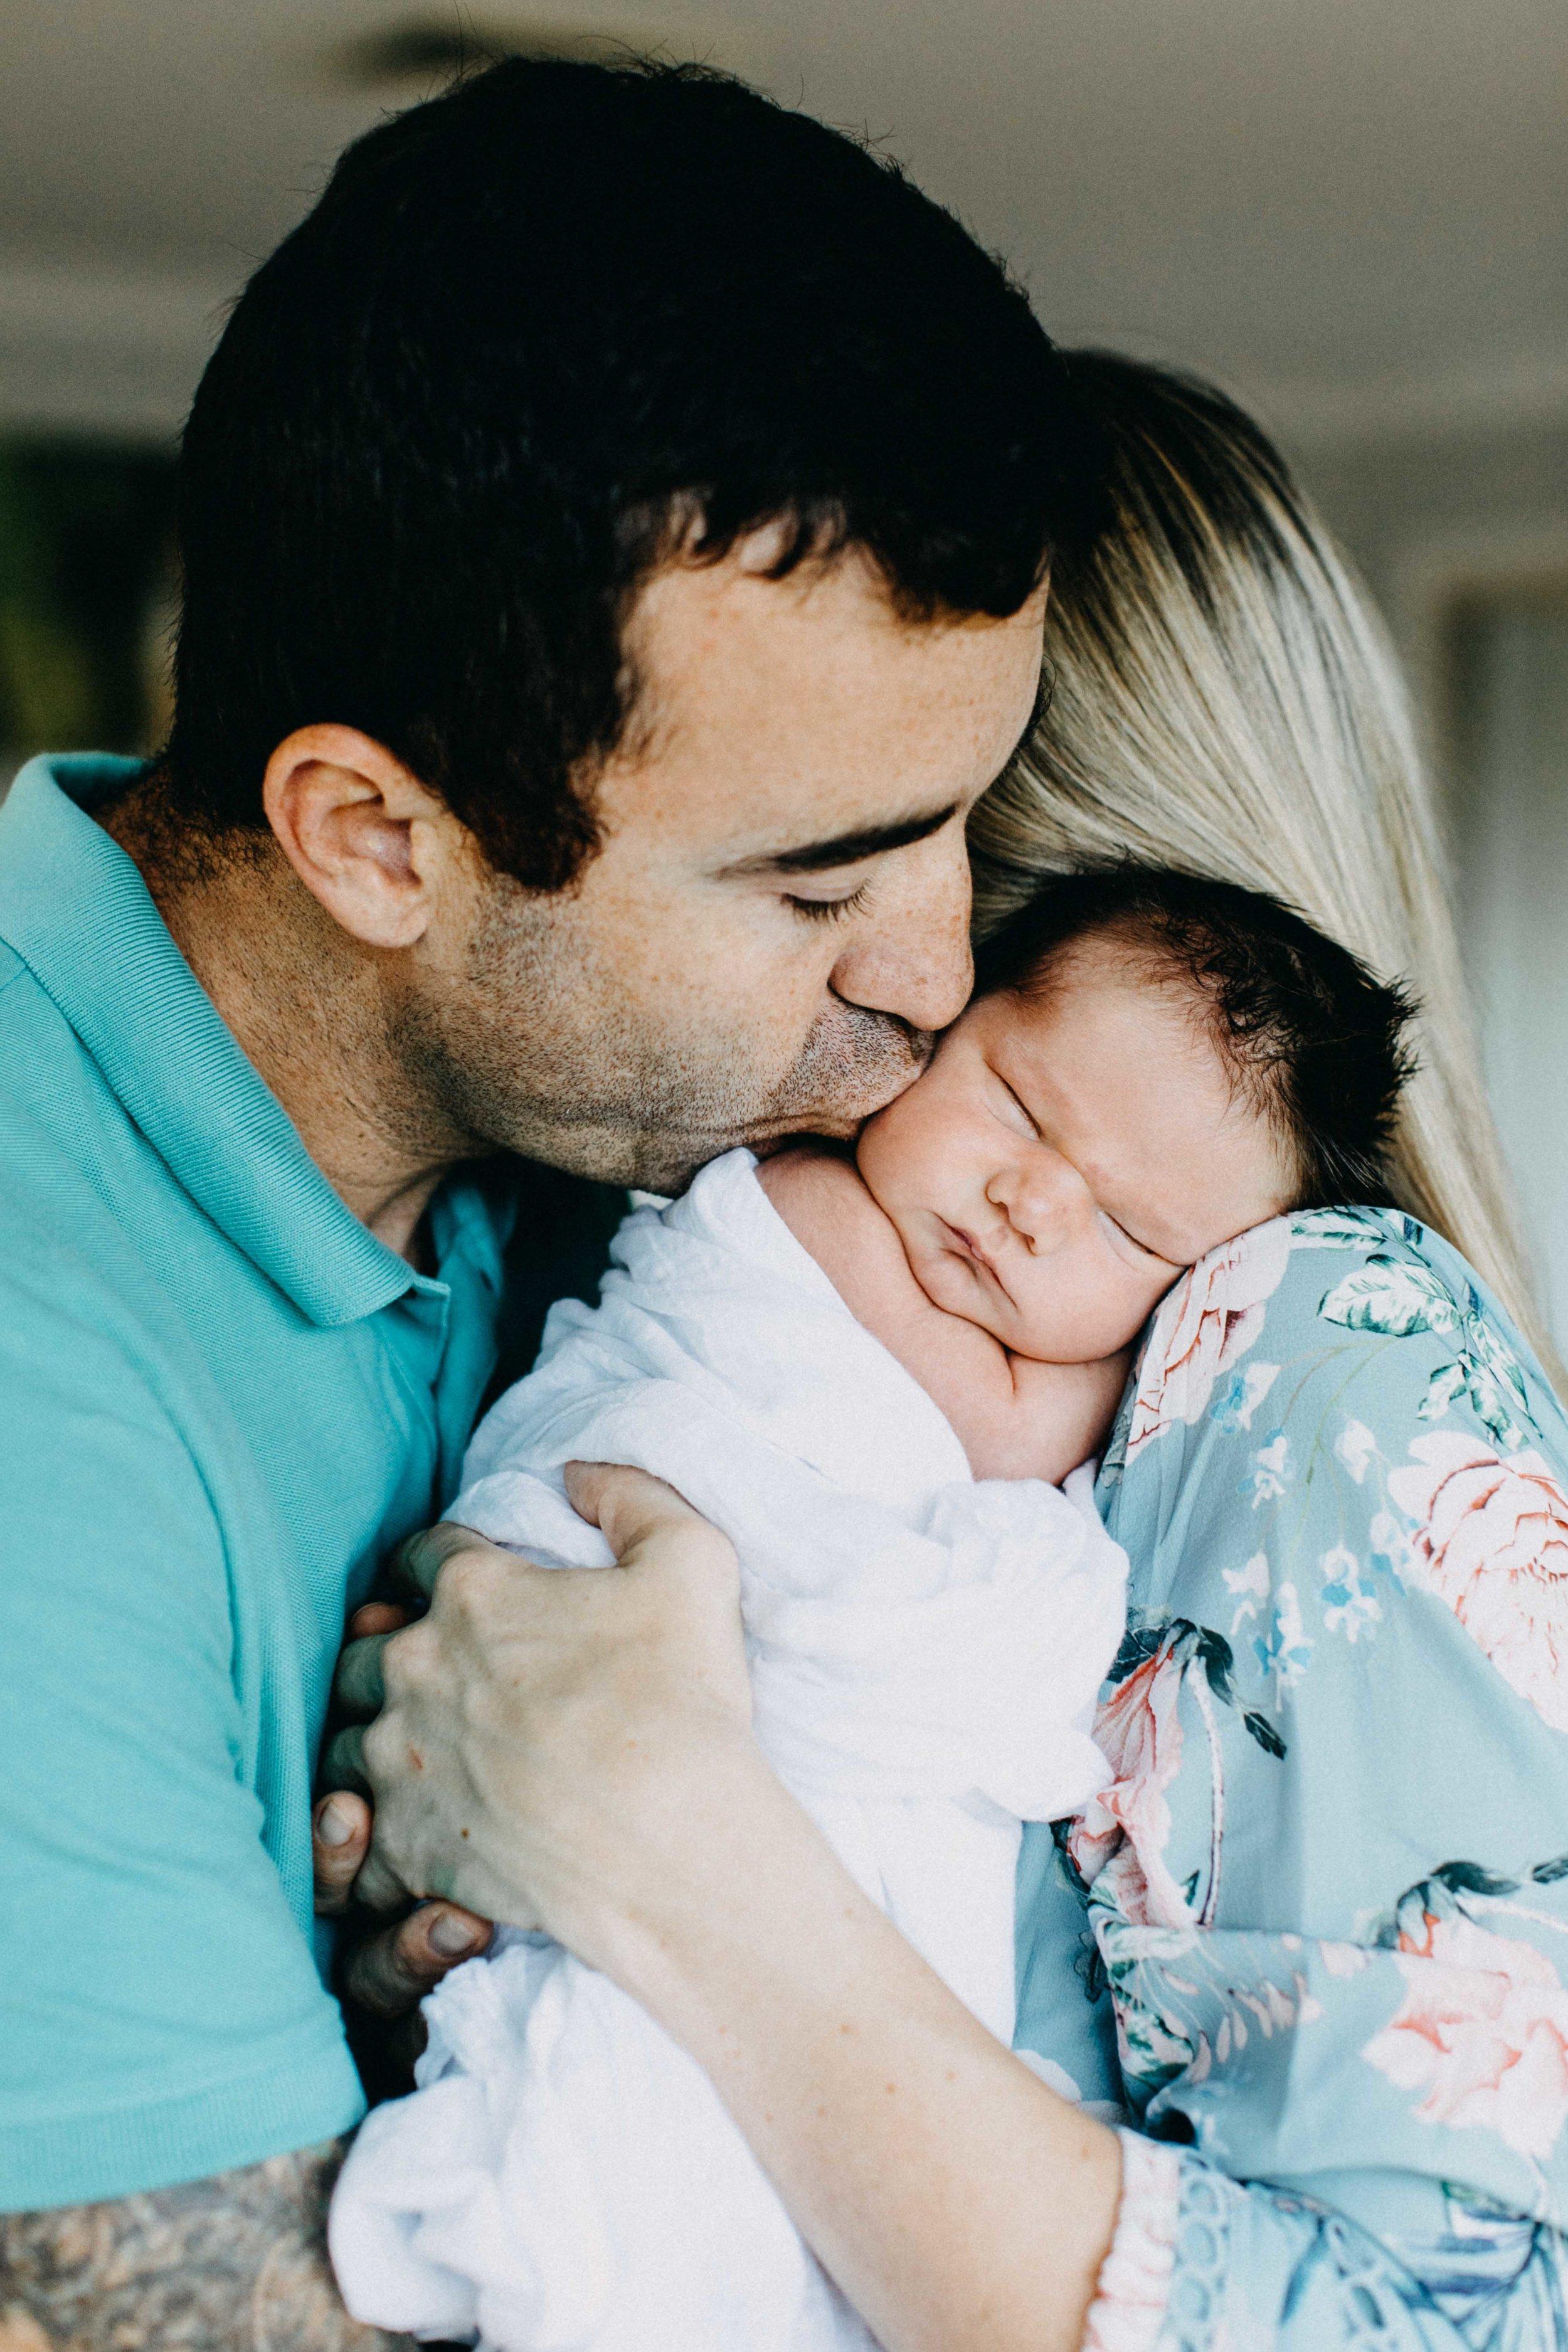 camden-newborn-photographer-laura-www.emilyobrienphotography.net-27.jpg